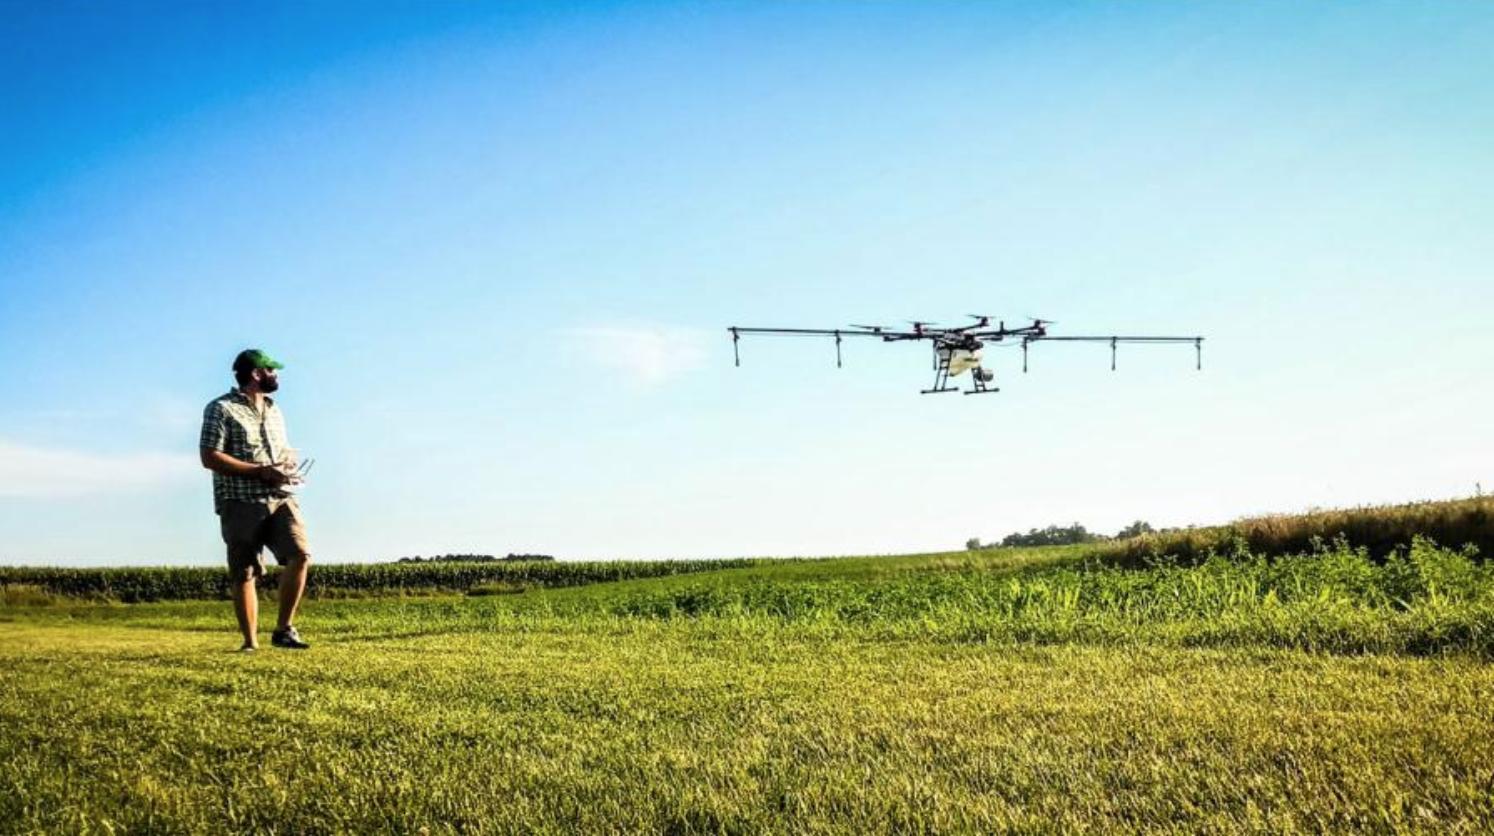 Mike Schmitz walks along side his Rantizo drone spraying crops